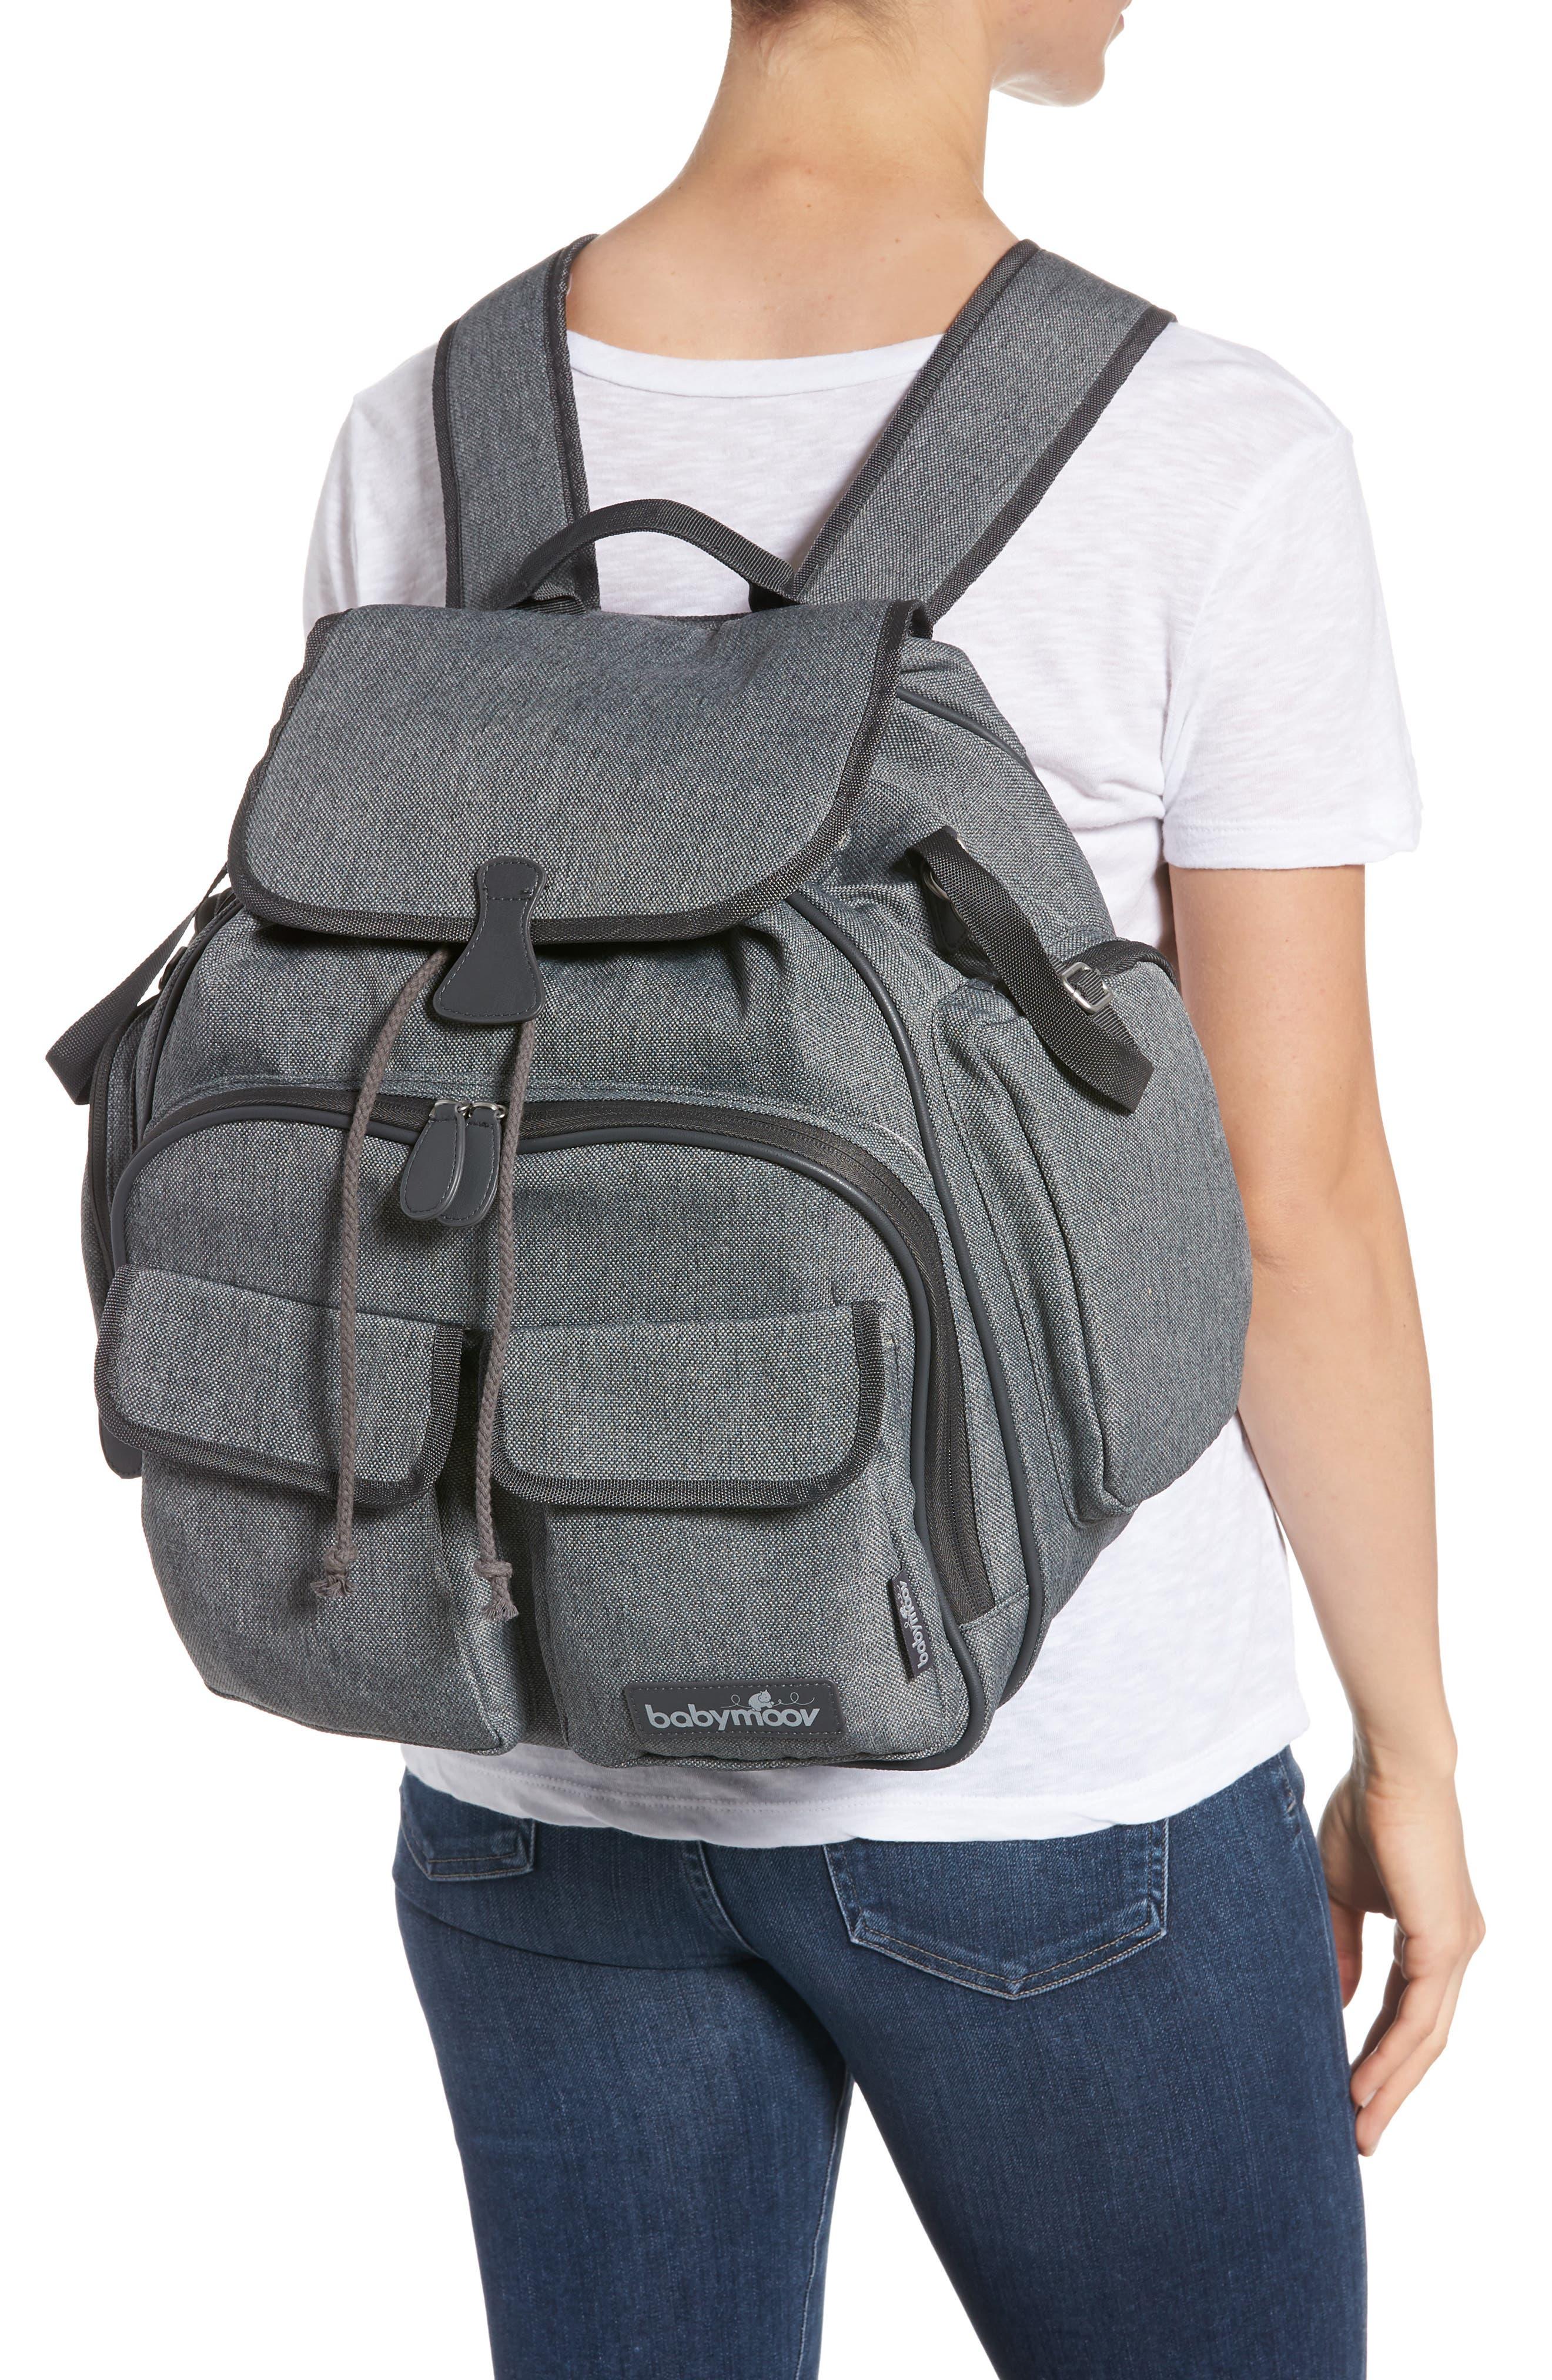 Glober Water Resistant Diaper Backpack,                             Alternate thumbnail 2, color,                             SMOKEY